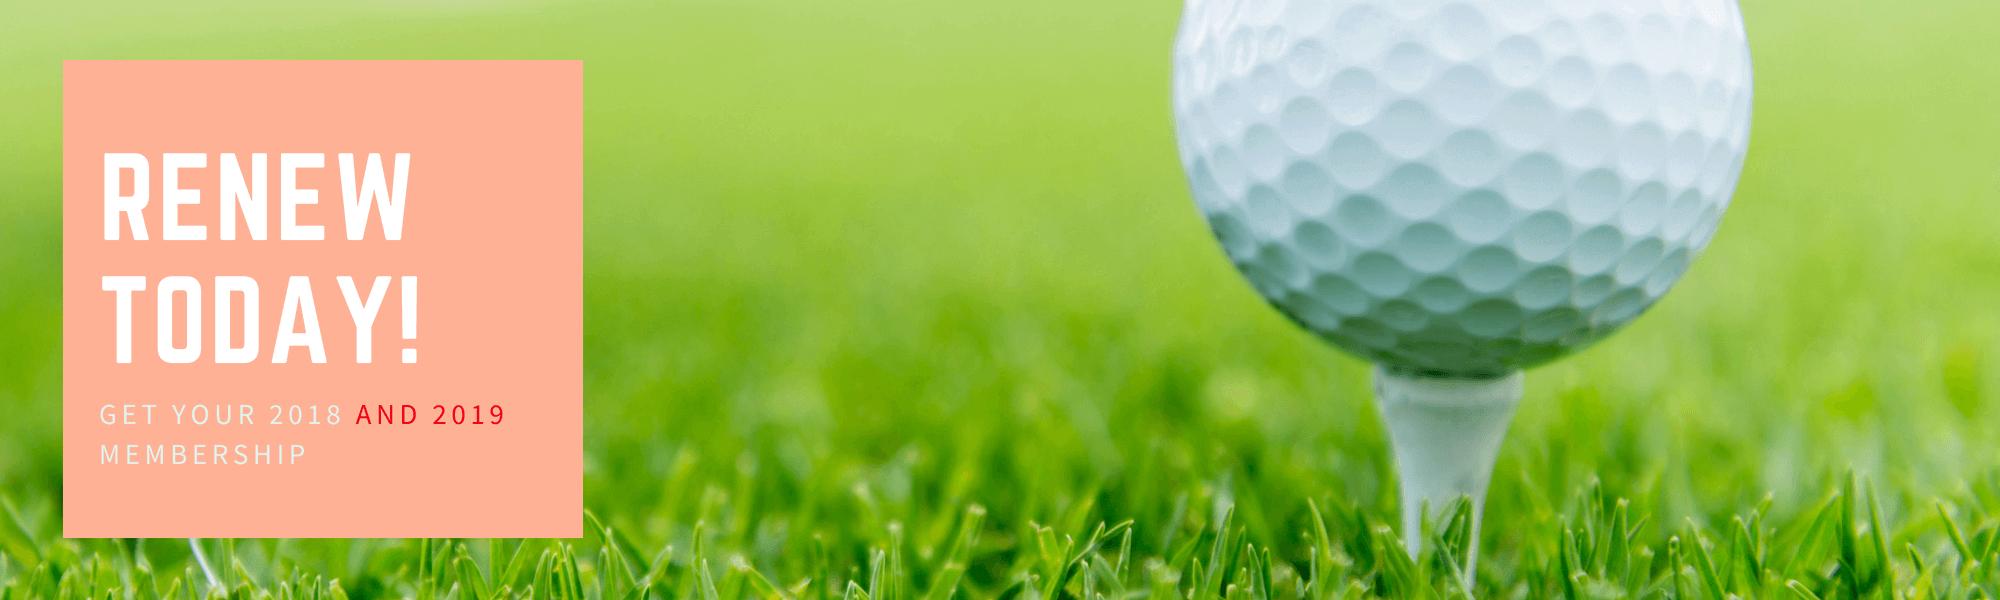 Join Senior Golfers of America